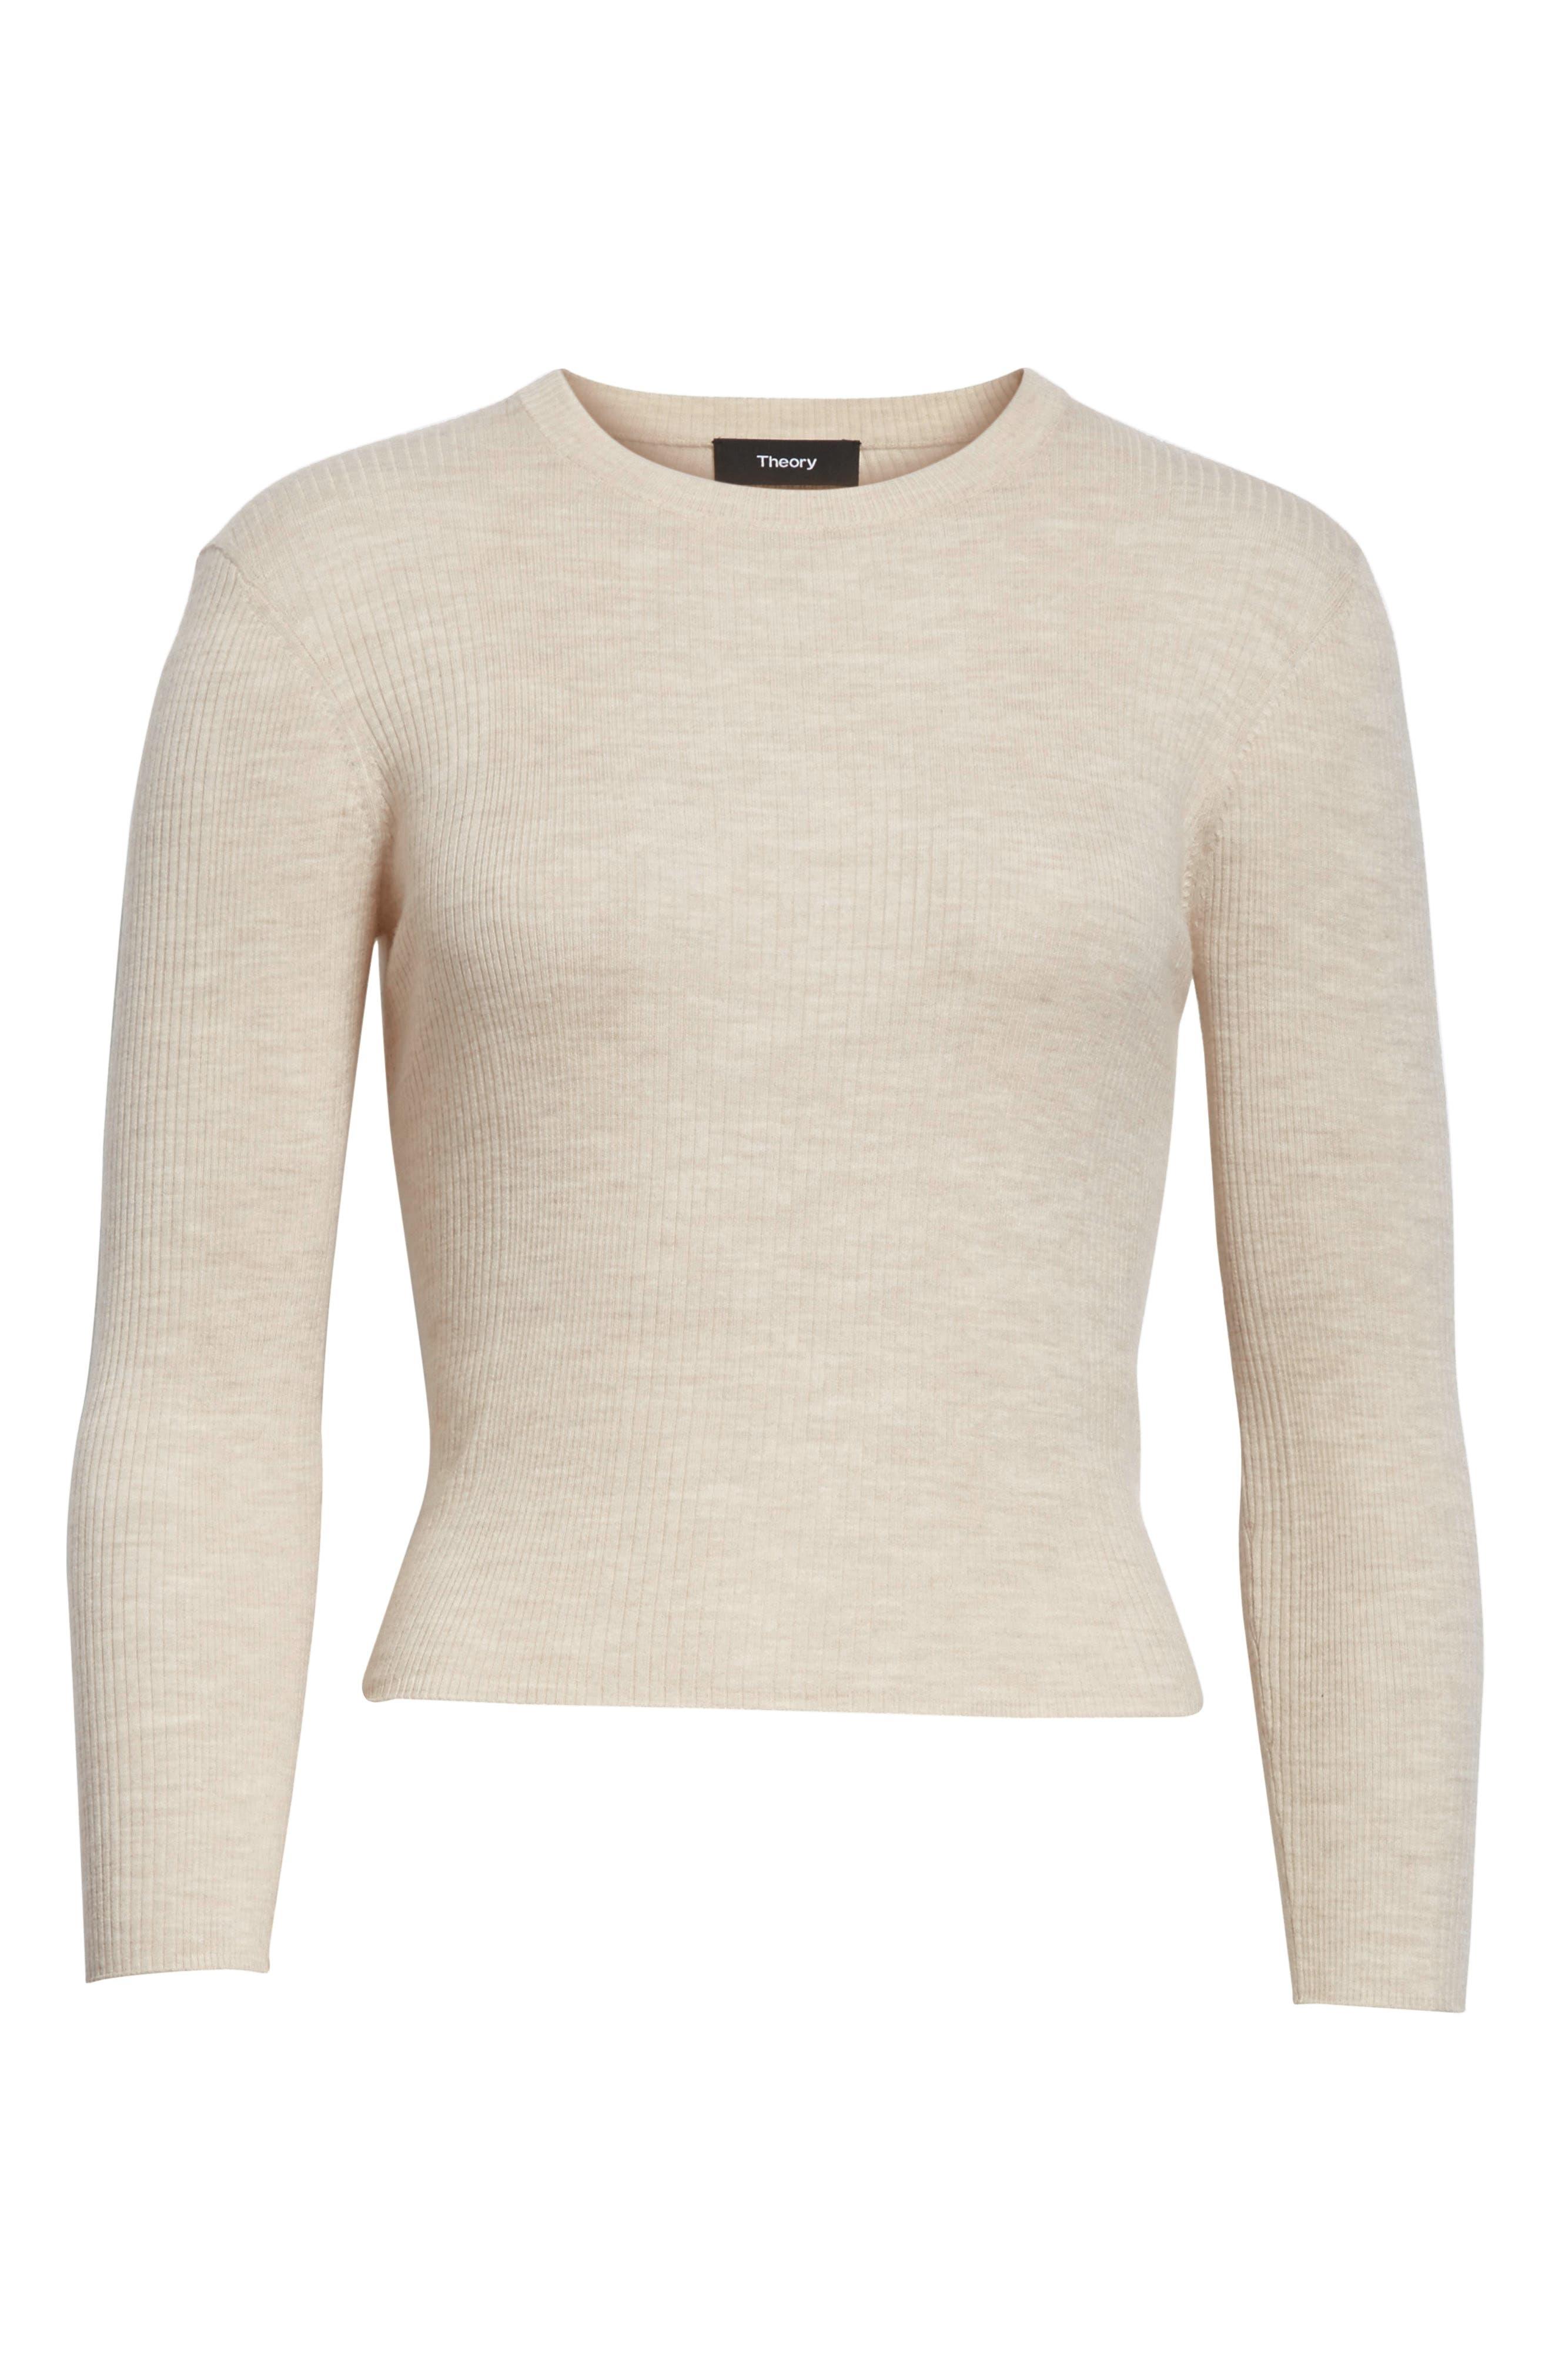 Merino Wool Blend Sweater,                             Alternate thumbnail 6, color,                             254